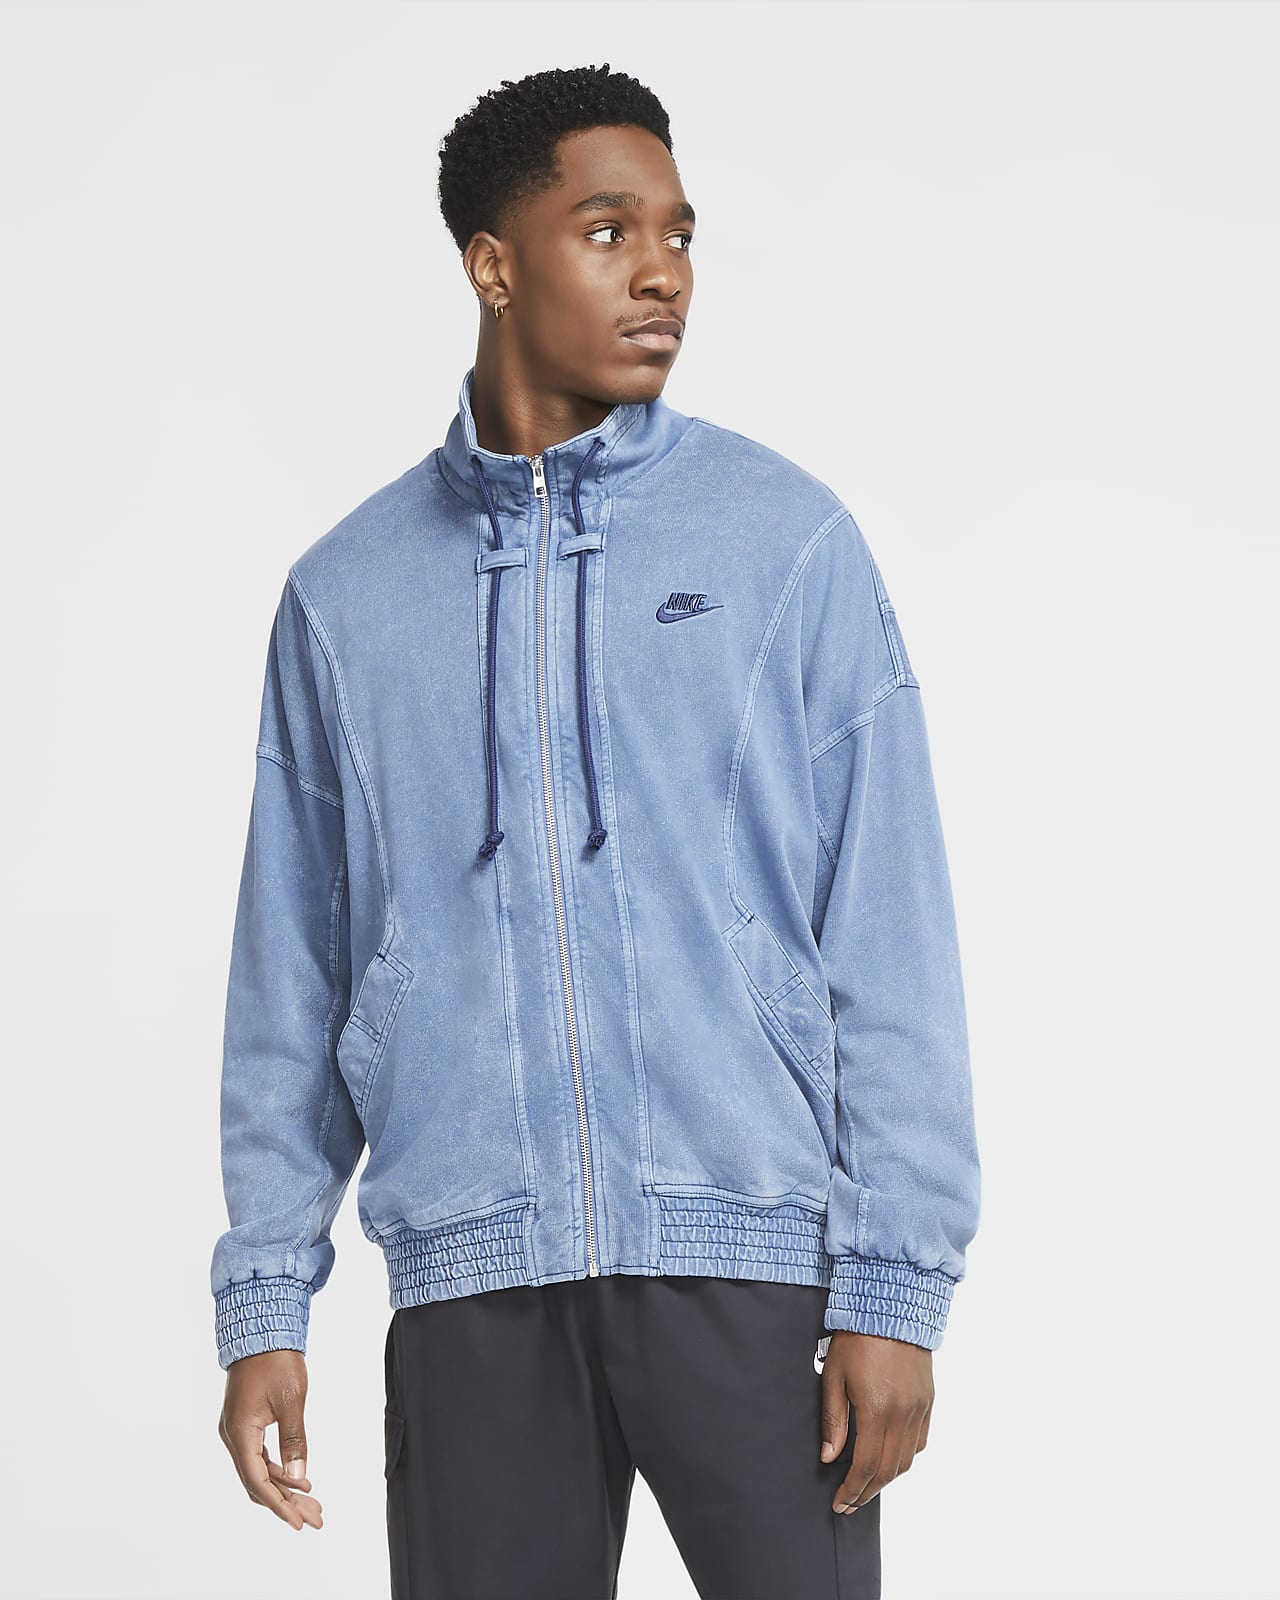 Nike Sportswear kötött, koptatott férfikabát